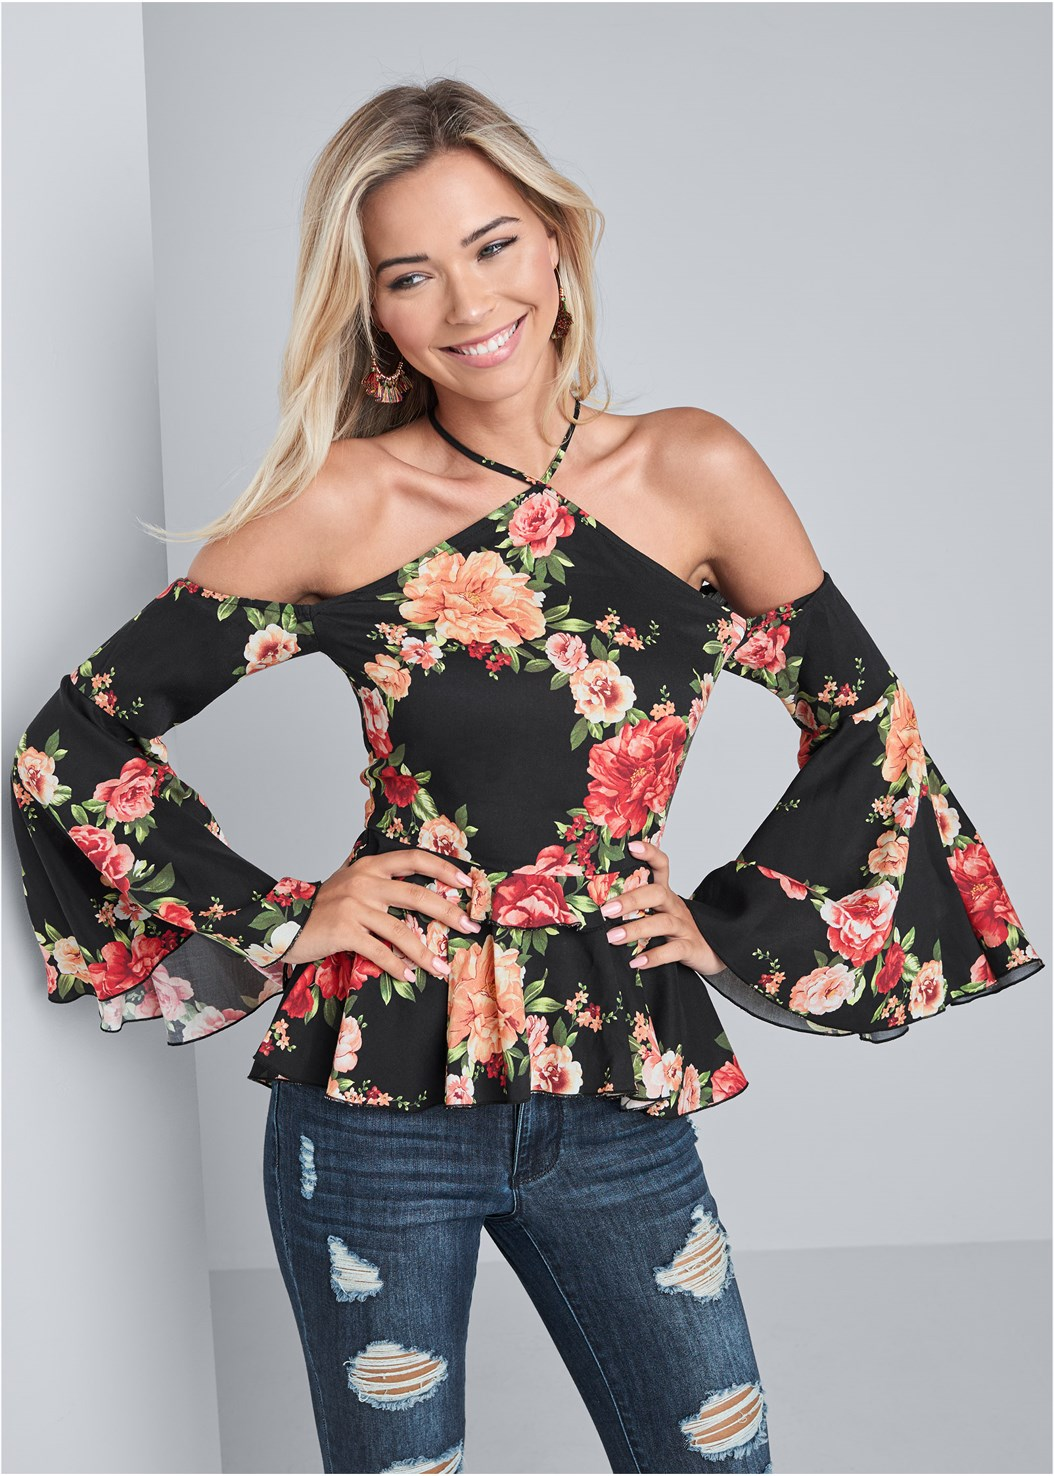 Floral Bell Sleeve Top,Ripped Bum Lifter Jeans,Fringe Handbag